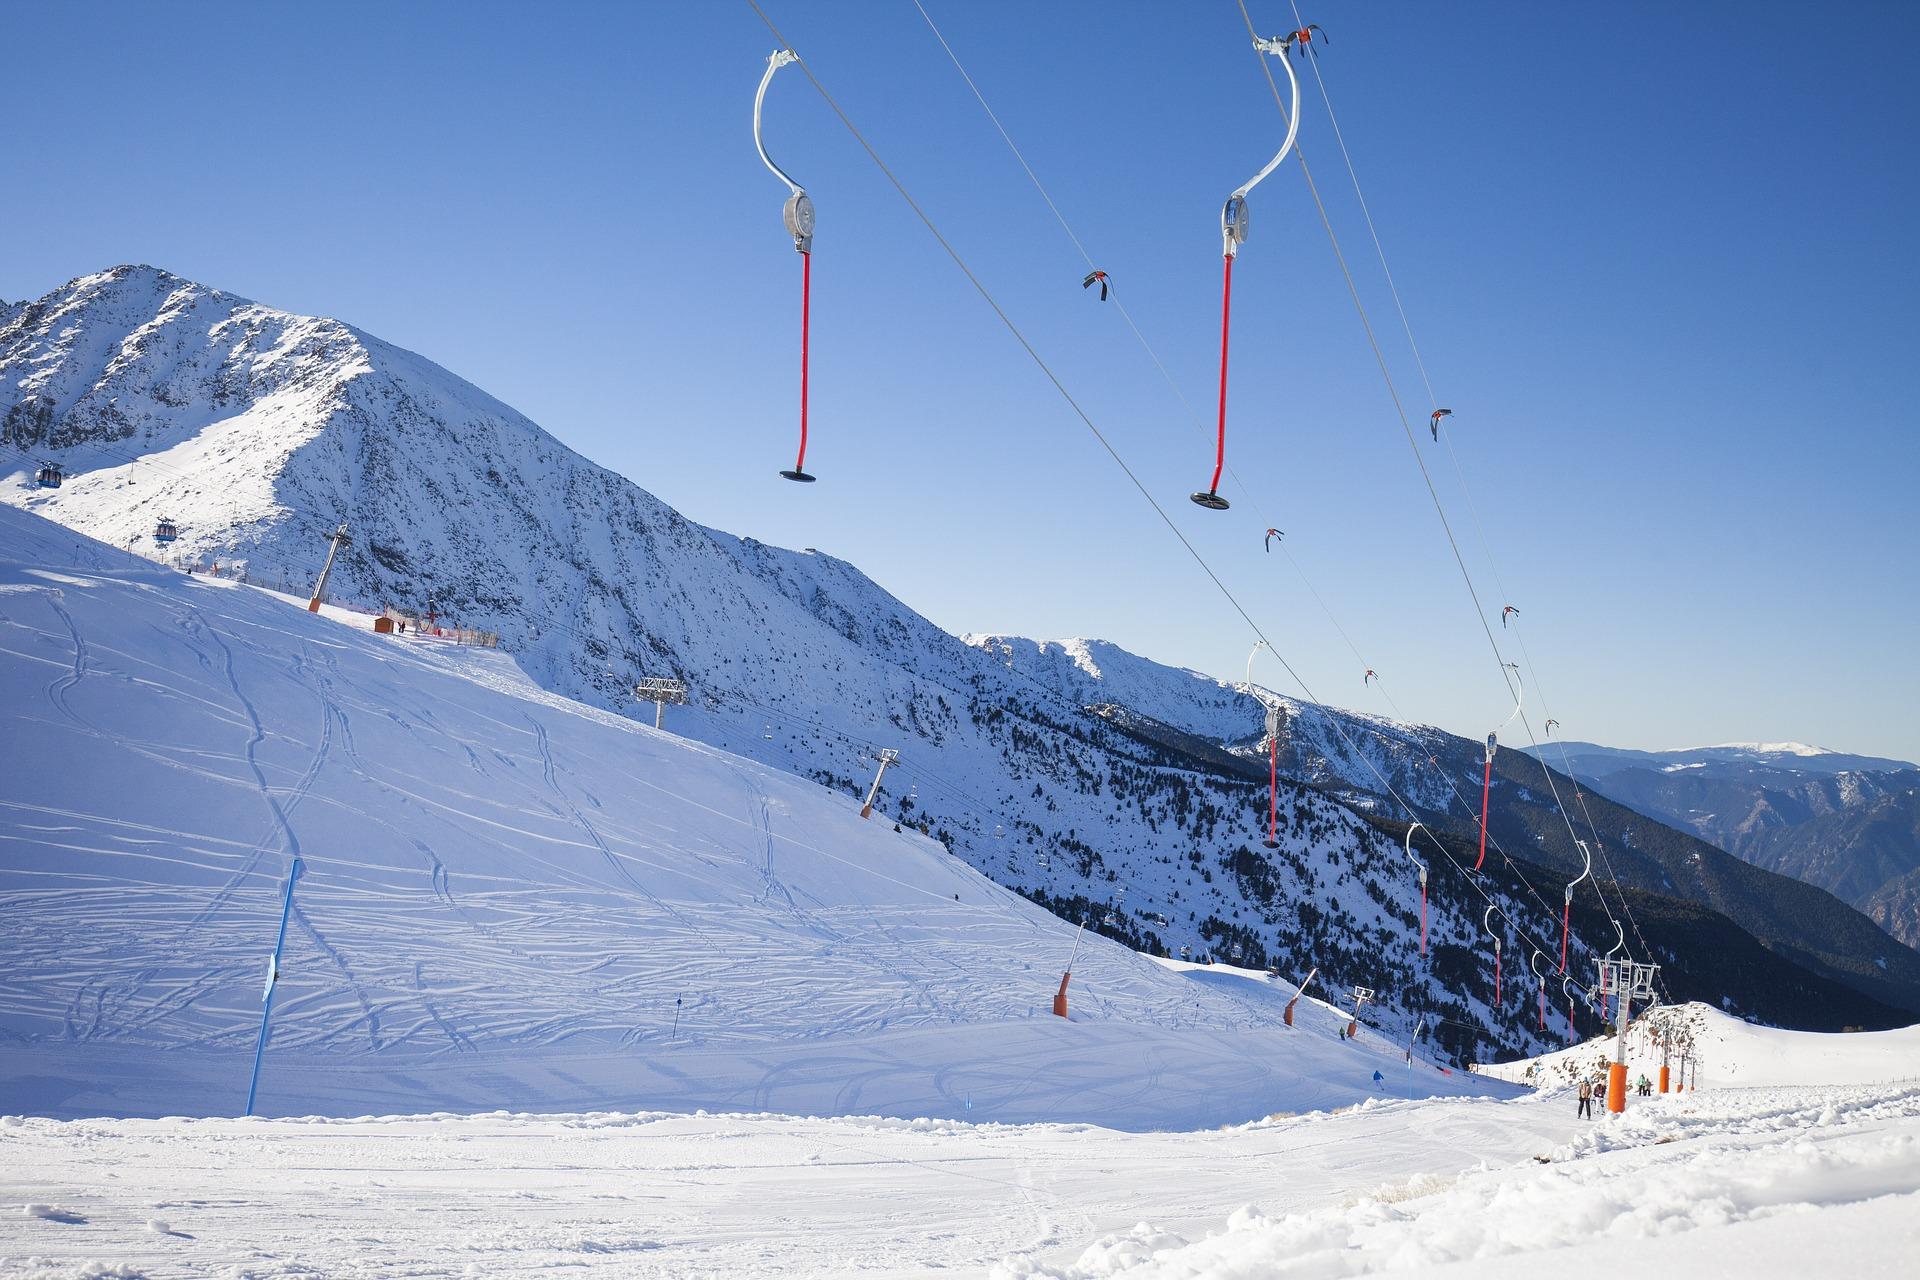 Andorre_pistes_ski_neige_CC0.jpg?1545814250